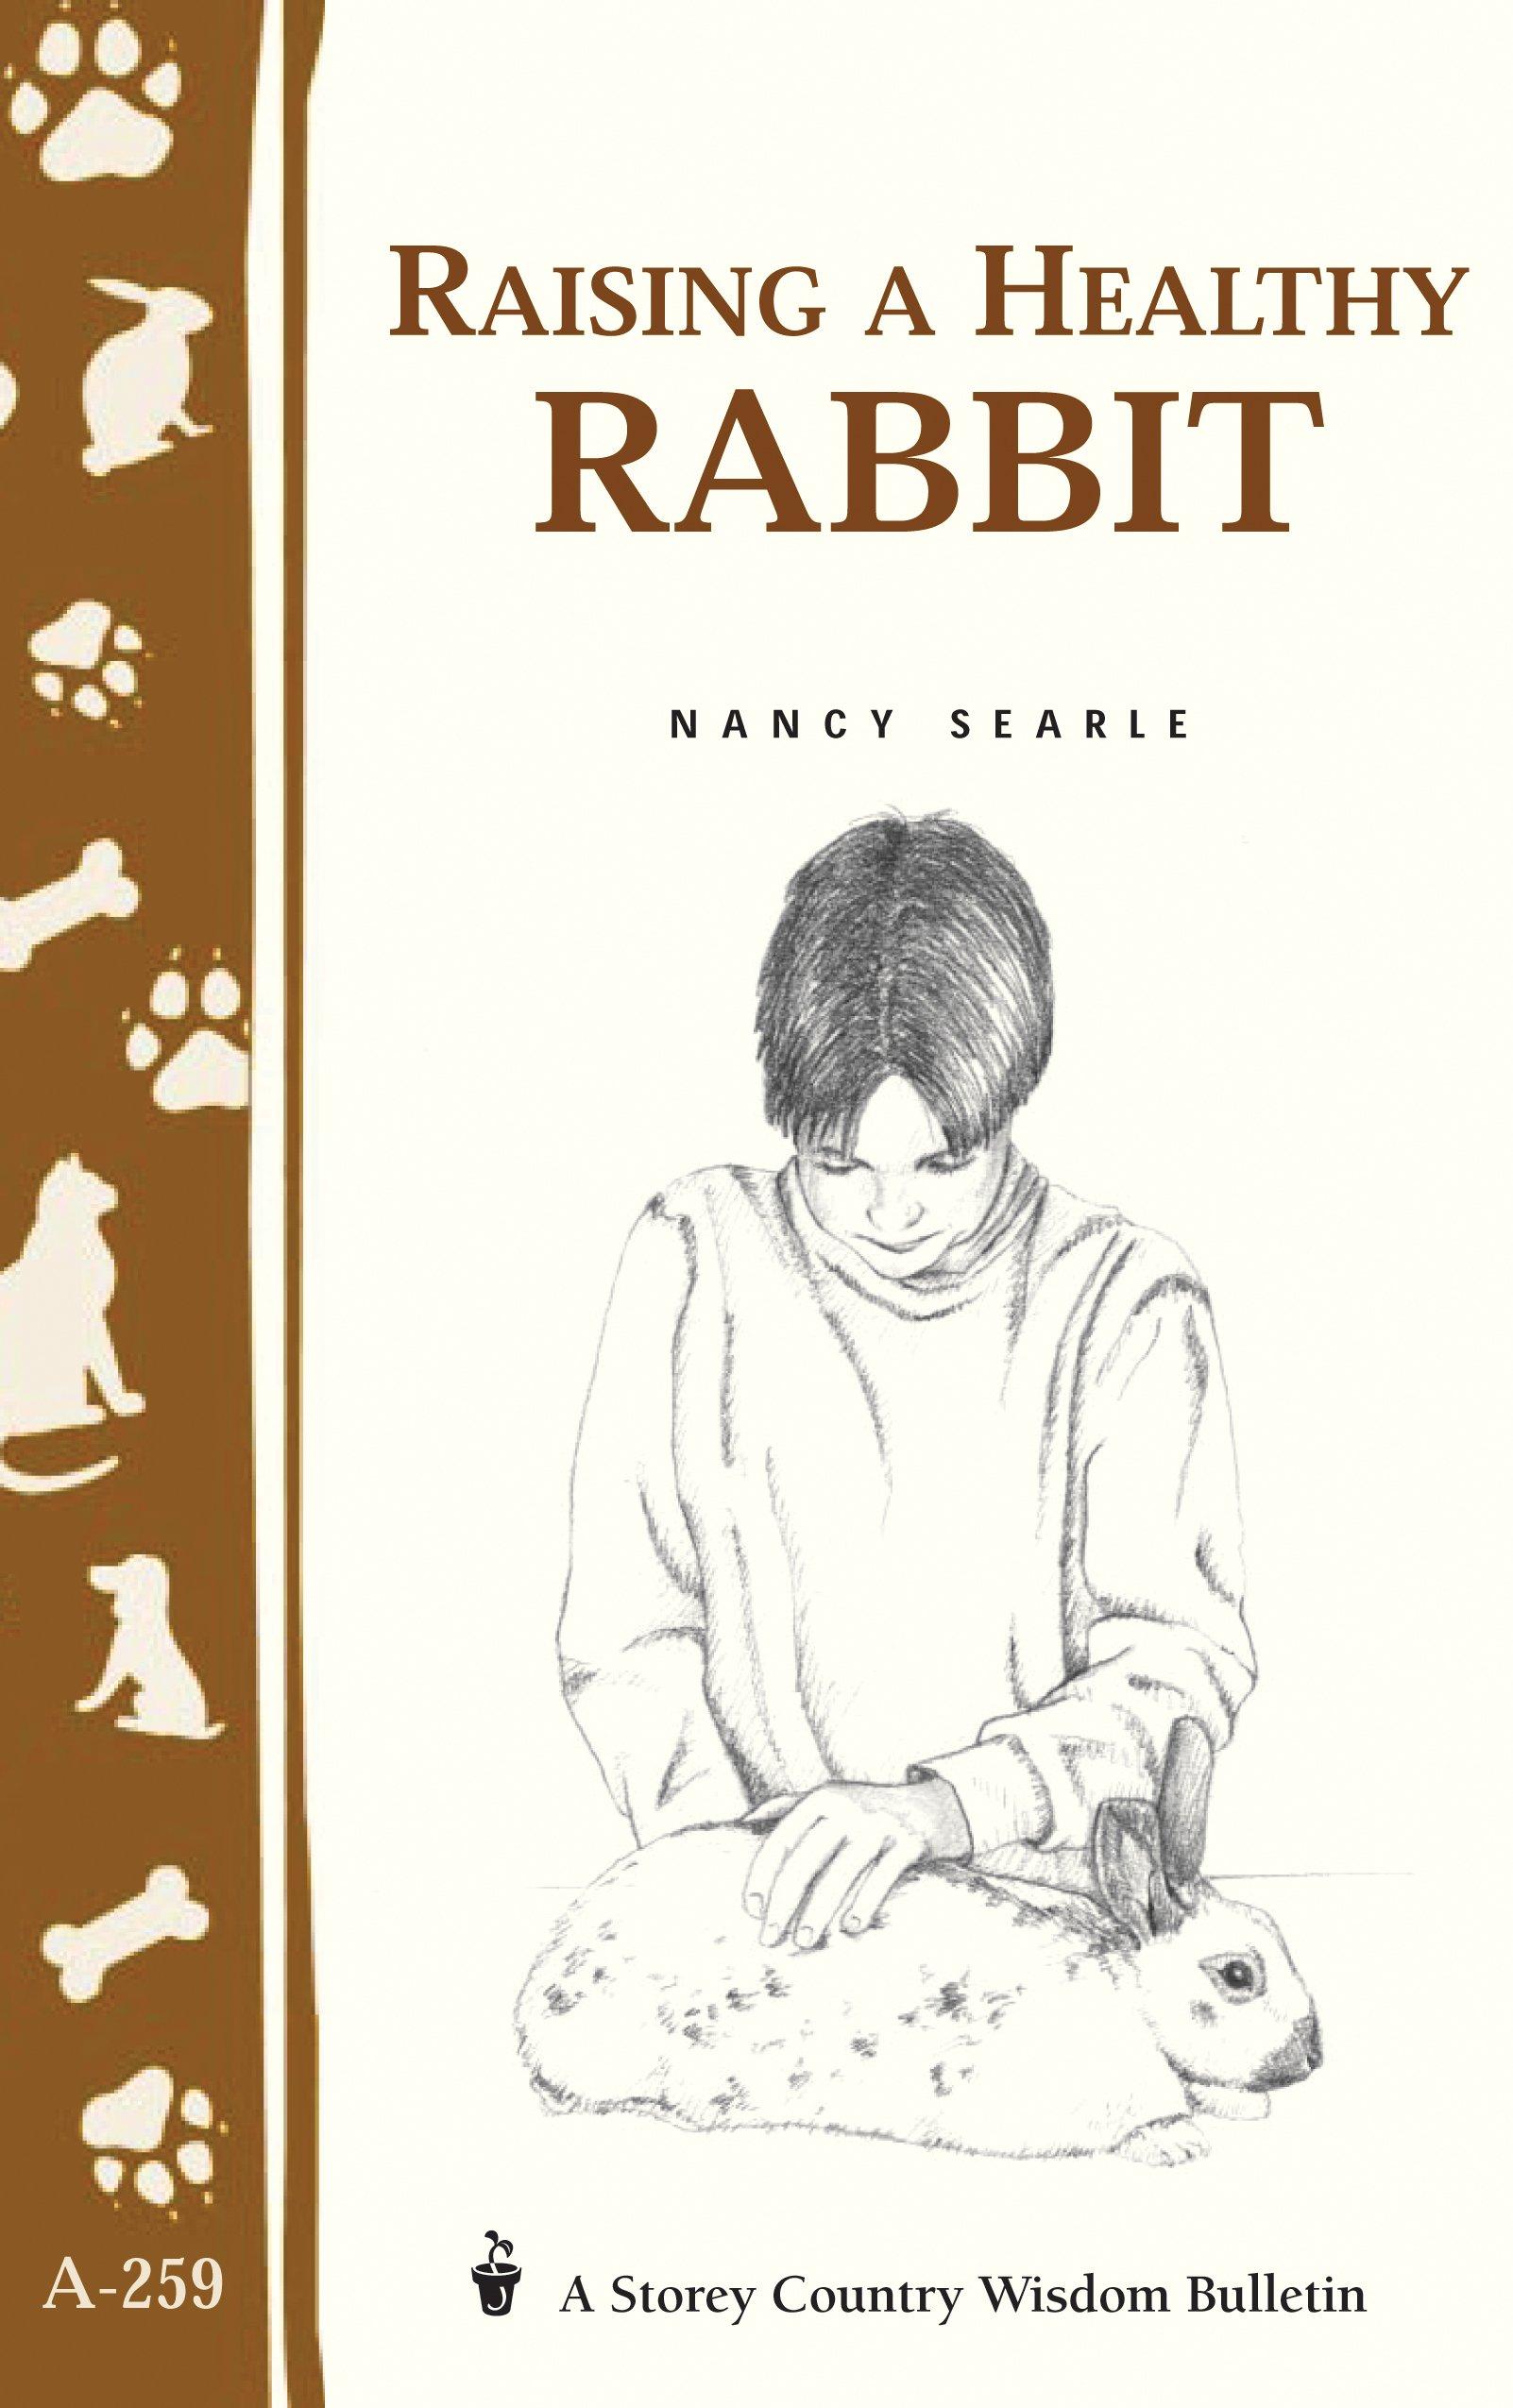 Raising a Healthy Rabbit: Storey's Country Wisdom Bulletin A-259 (Storey Country Wisdom Bulletin, A-259) ebook